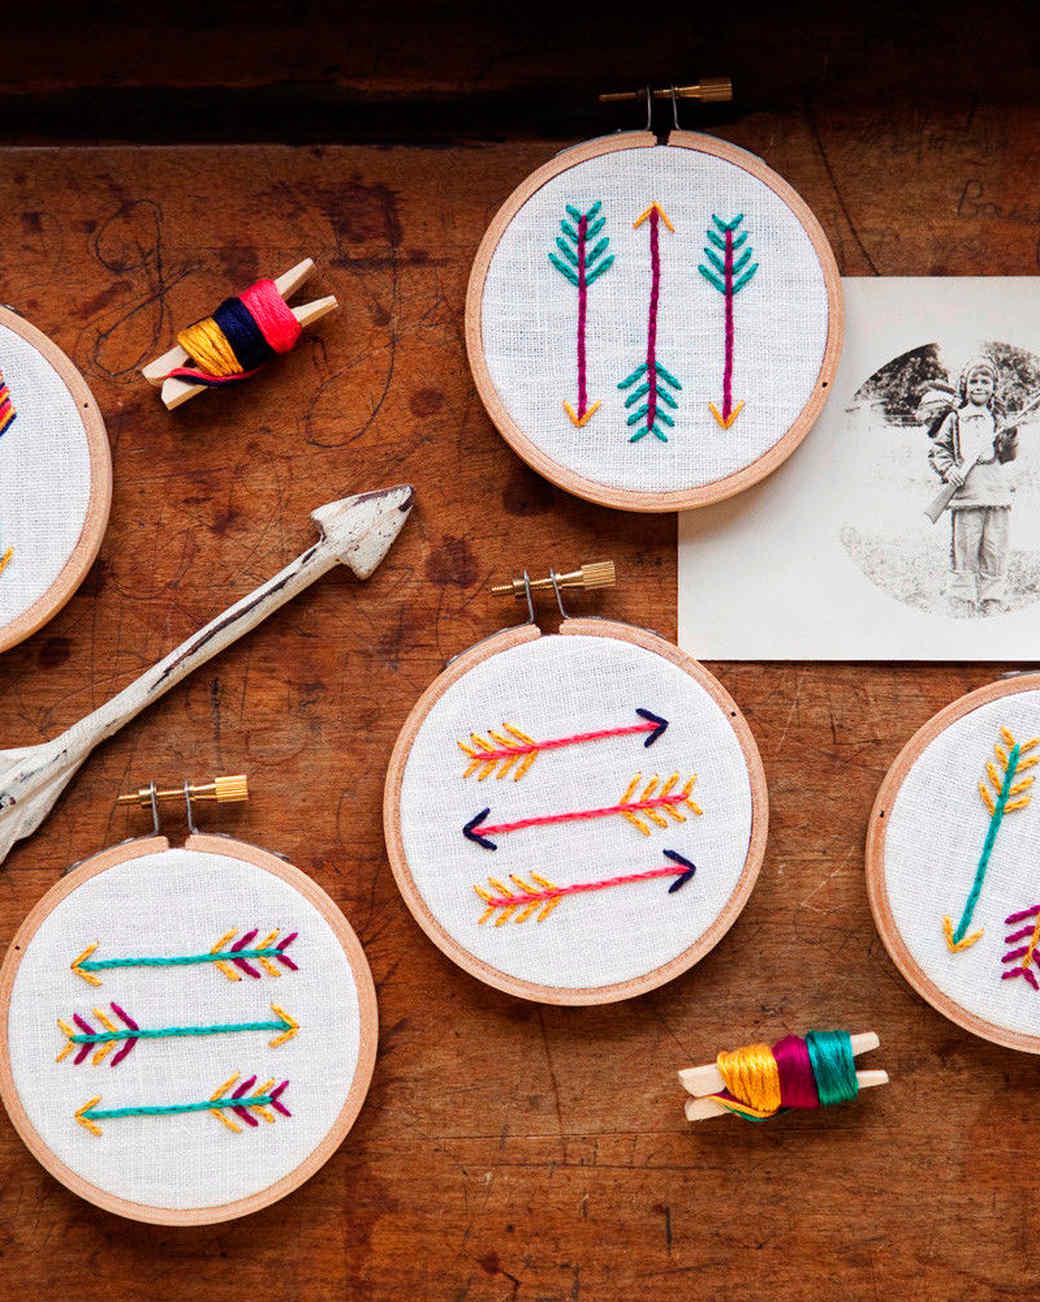 miniaturerhino-mini-arrow-embroidery-kit-0915.jpg